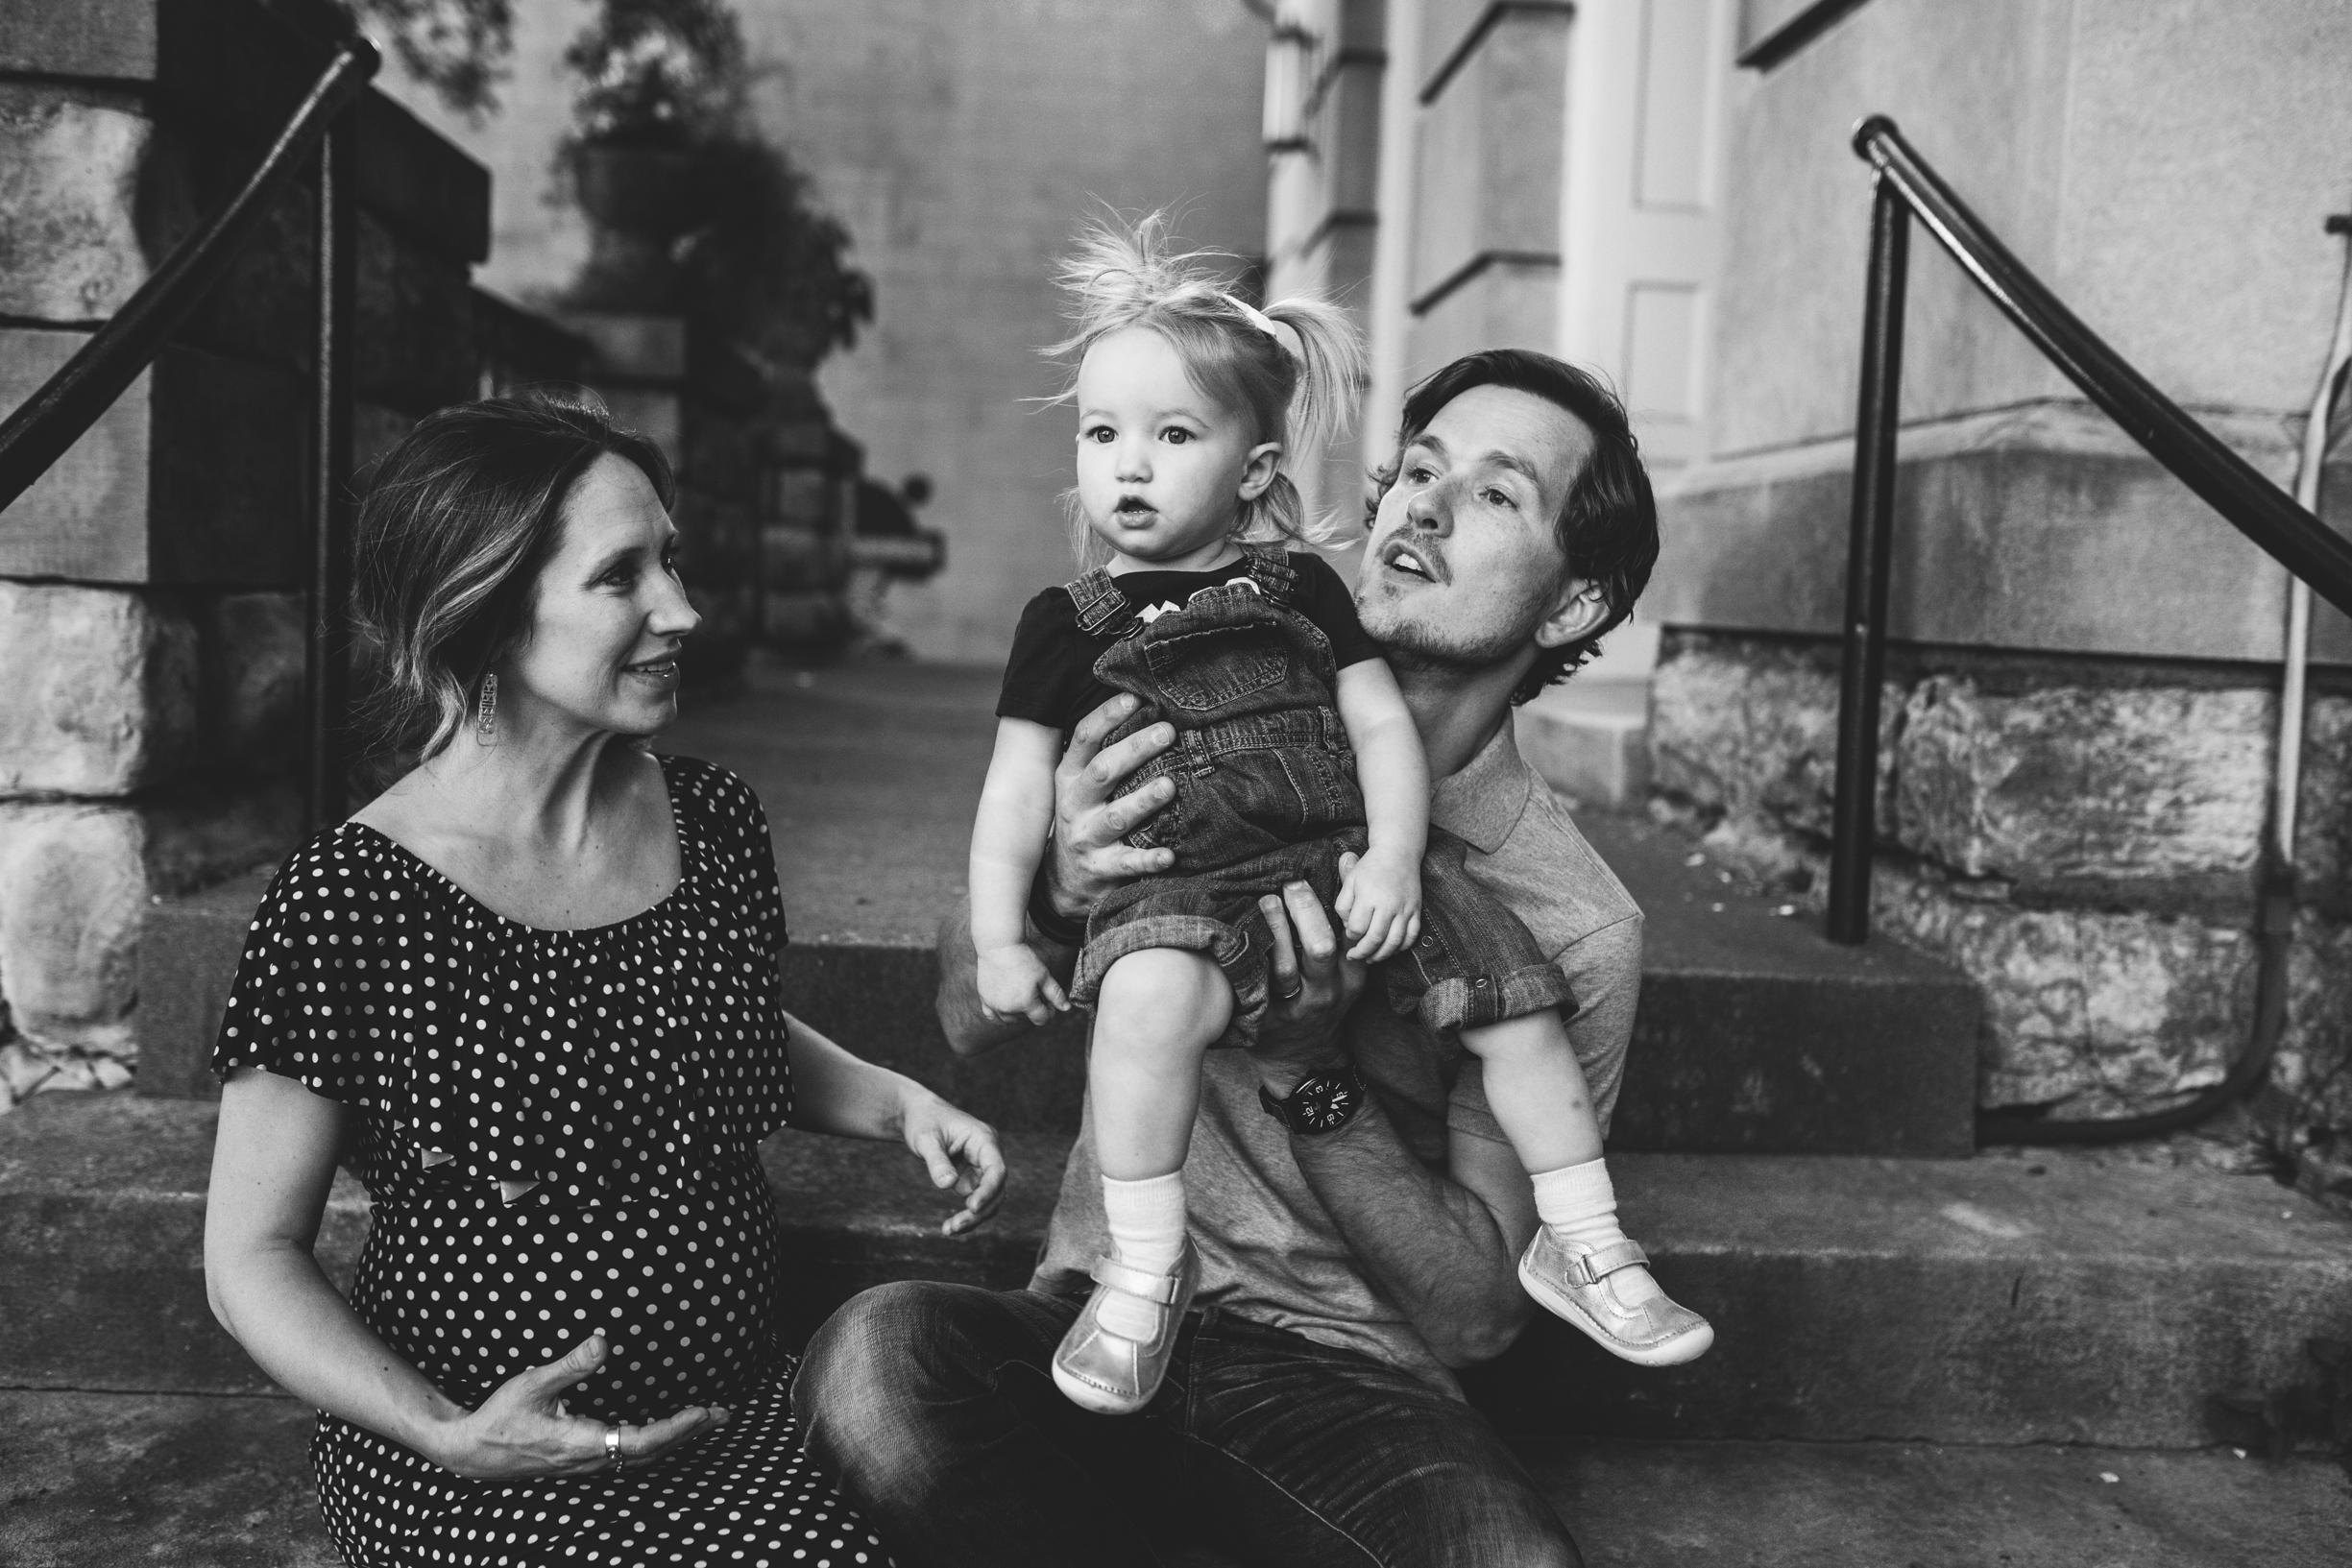 Disney Family 2017 (baby bump) WEBSITE Crystal Ludwick Photo (55 of 68).jpg